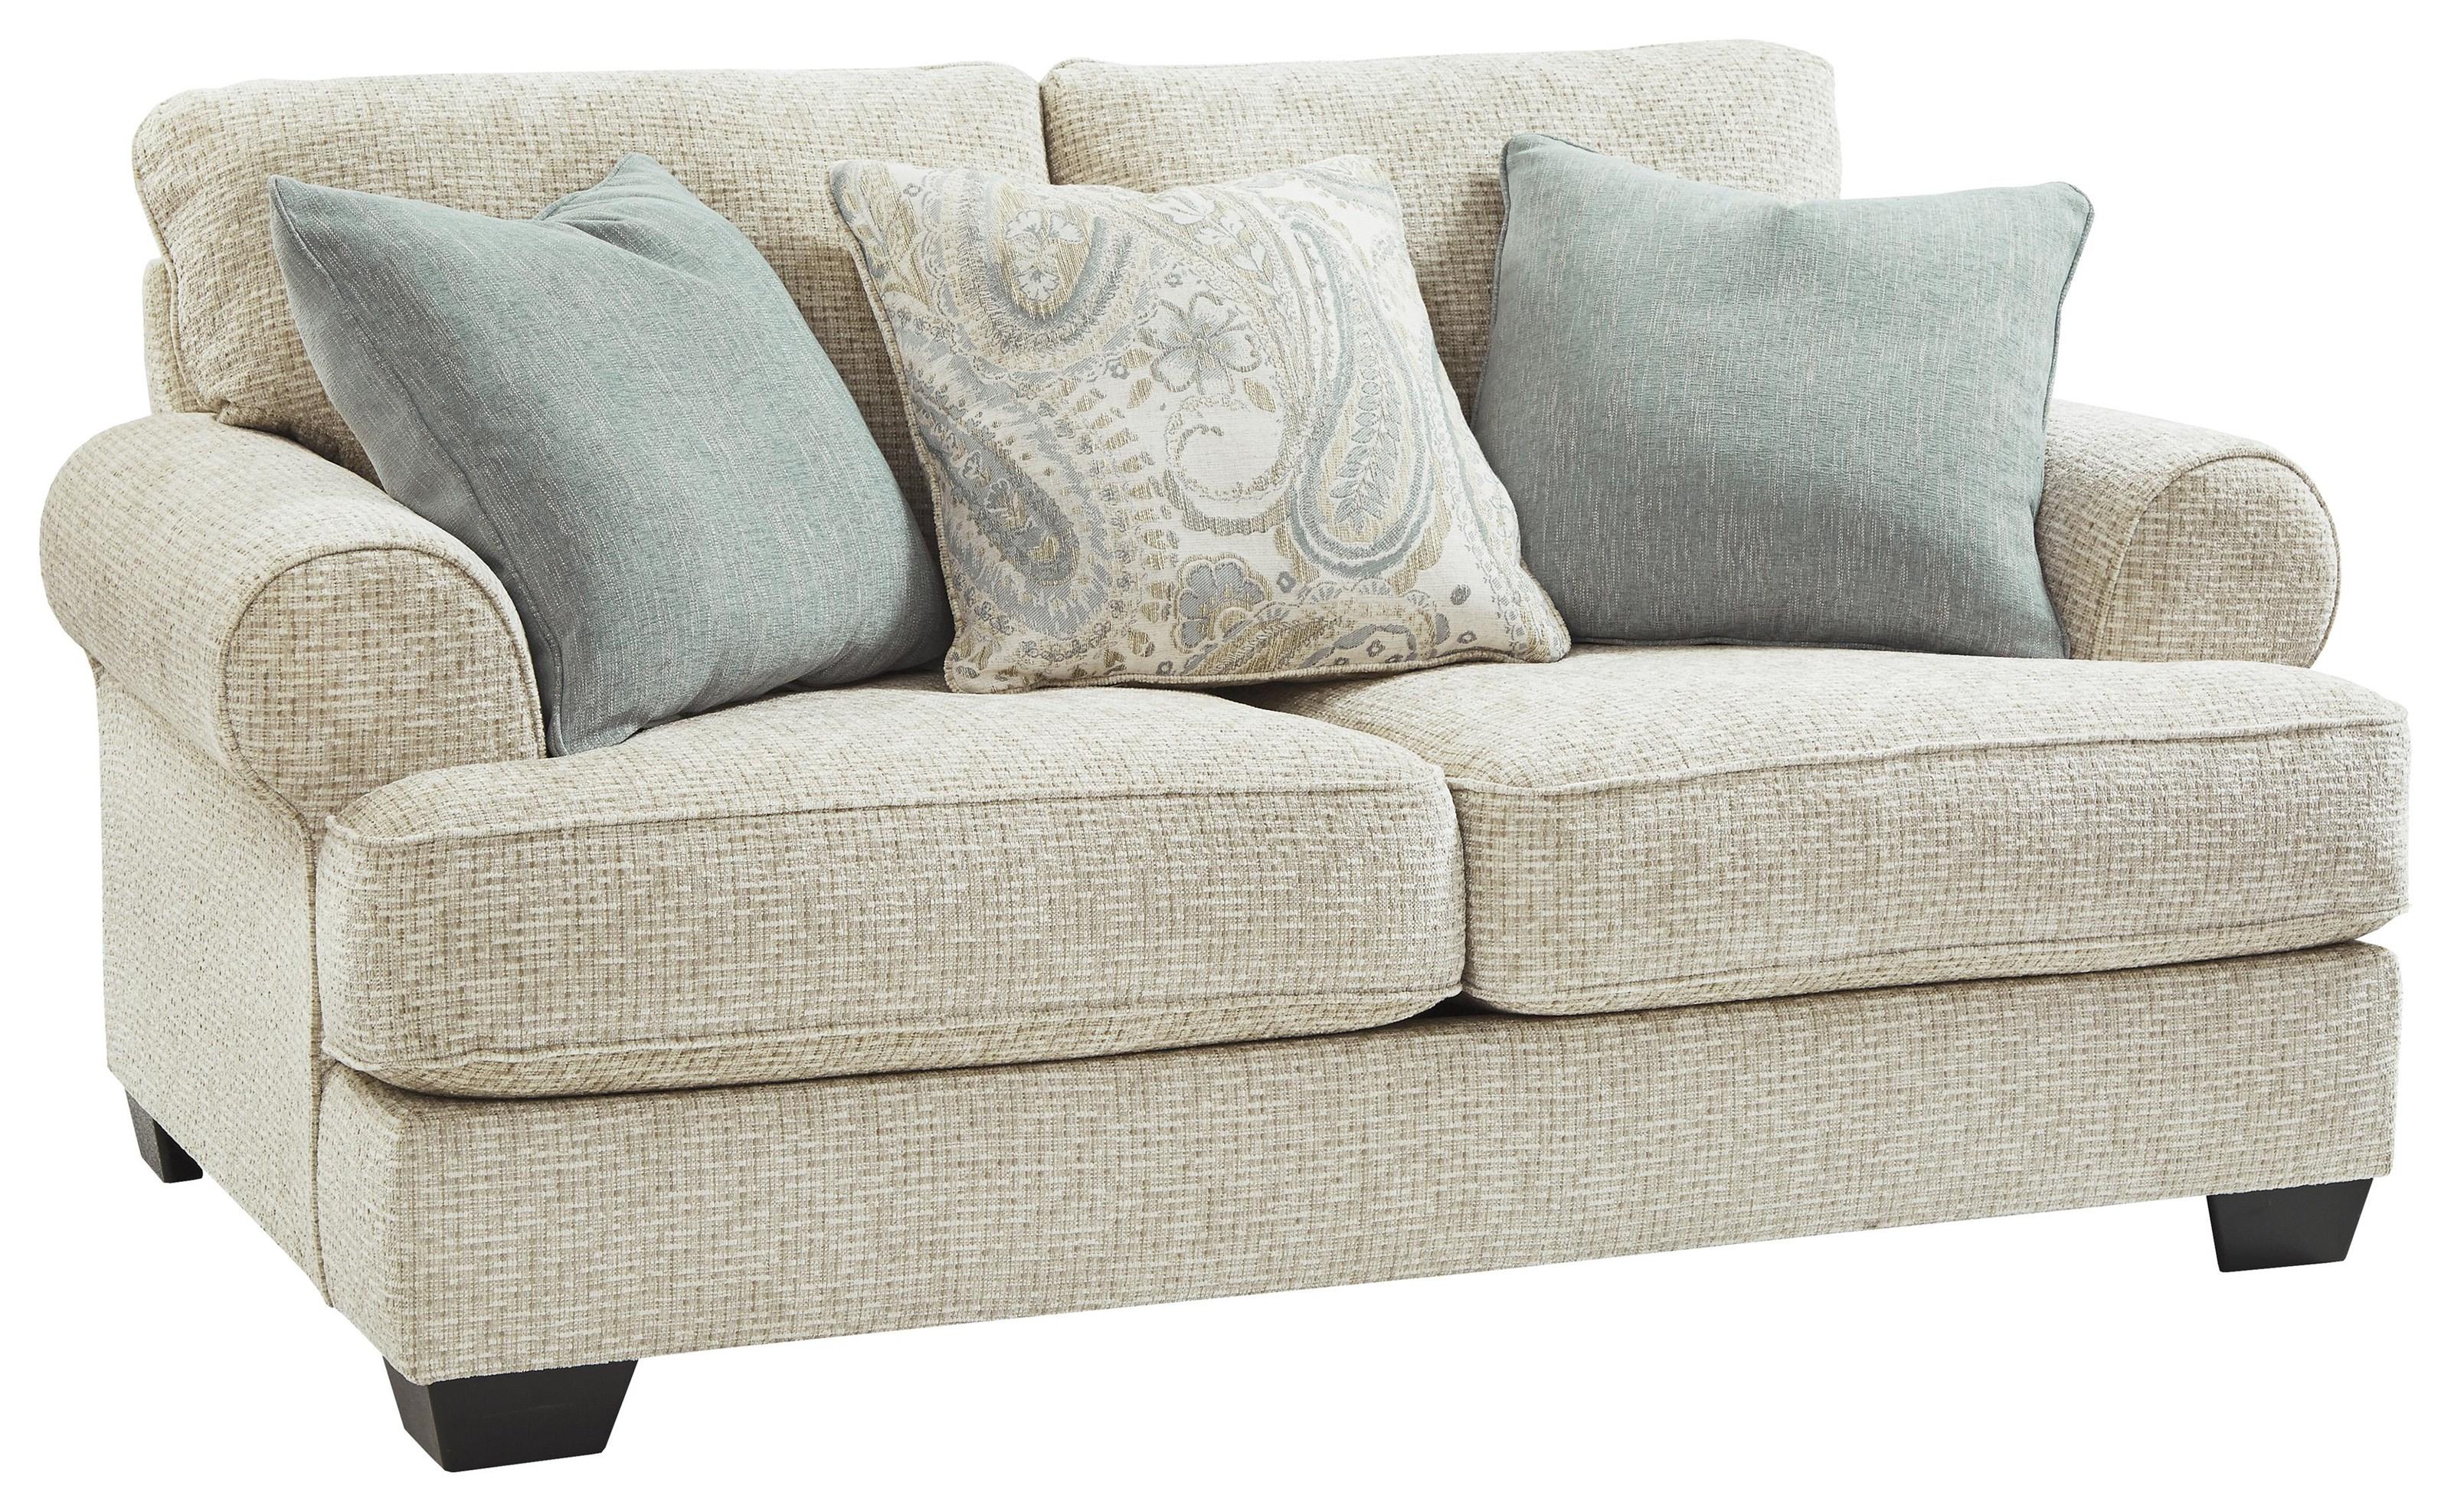 Ashley Furniture Monaghan 9620535 Sandstone Loveseat Sam